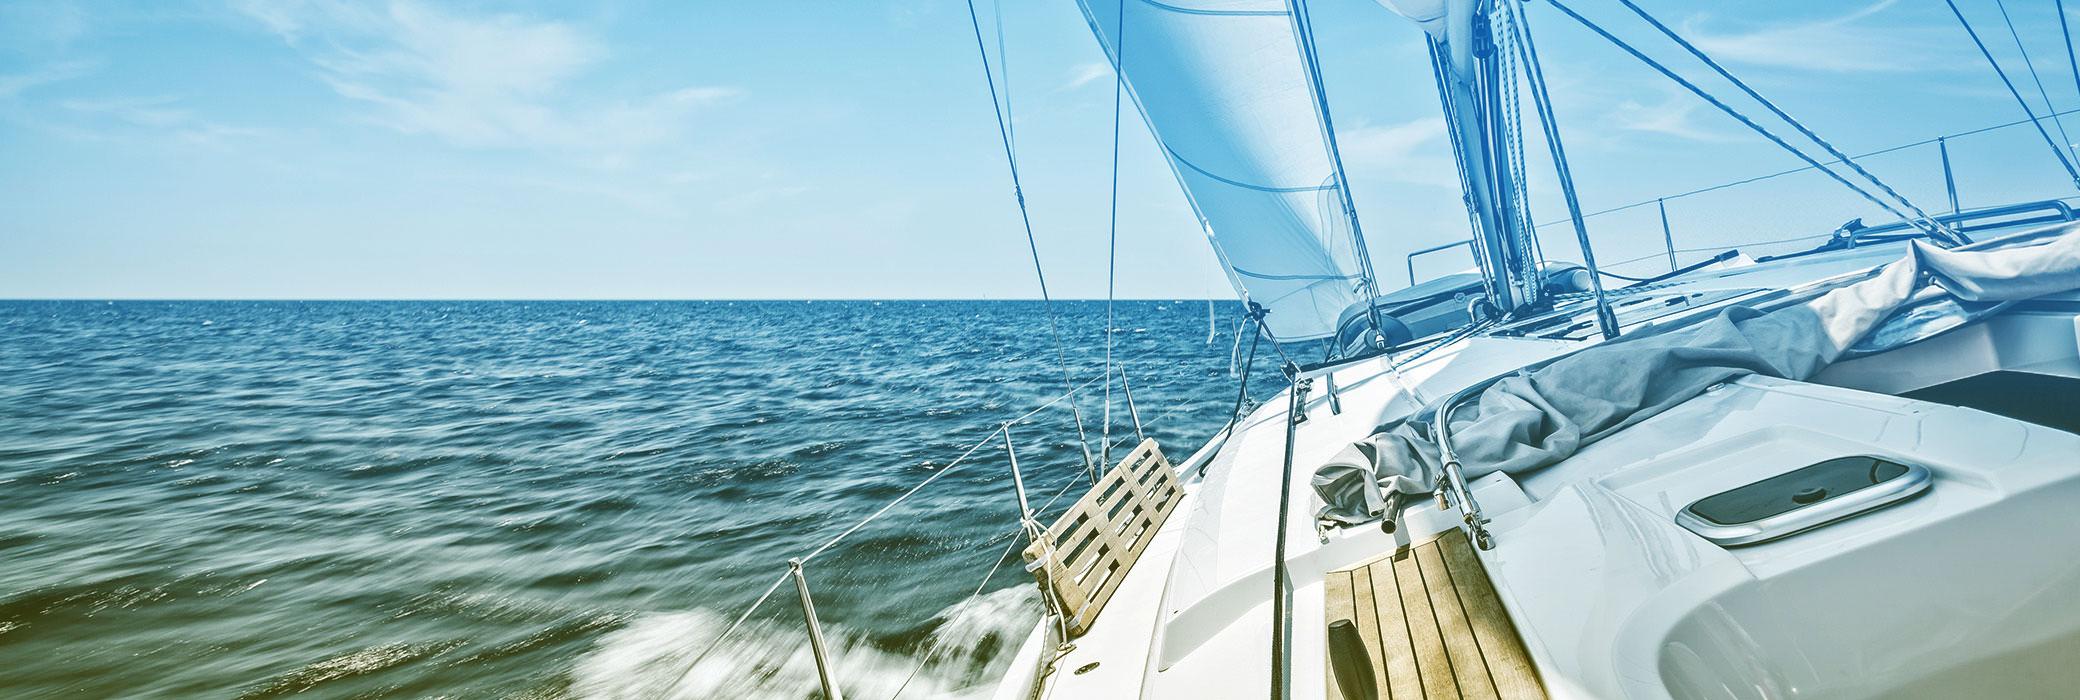 Белая парусная лодка на воде